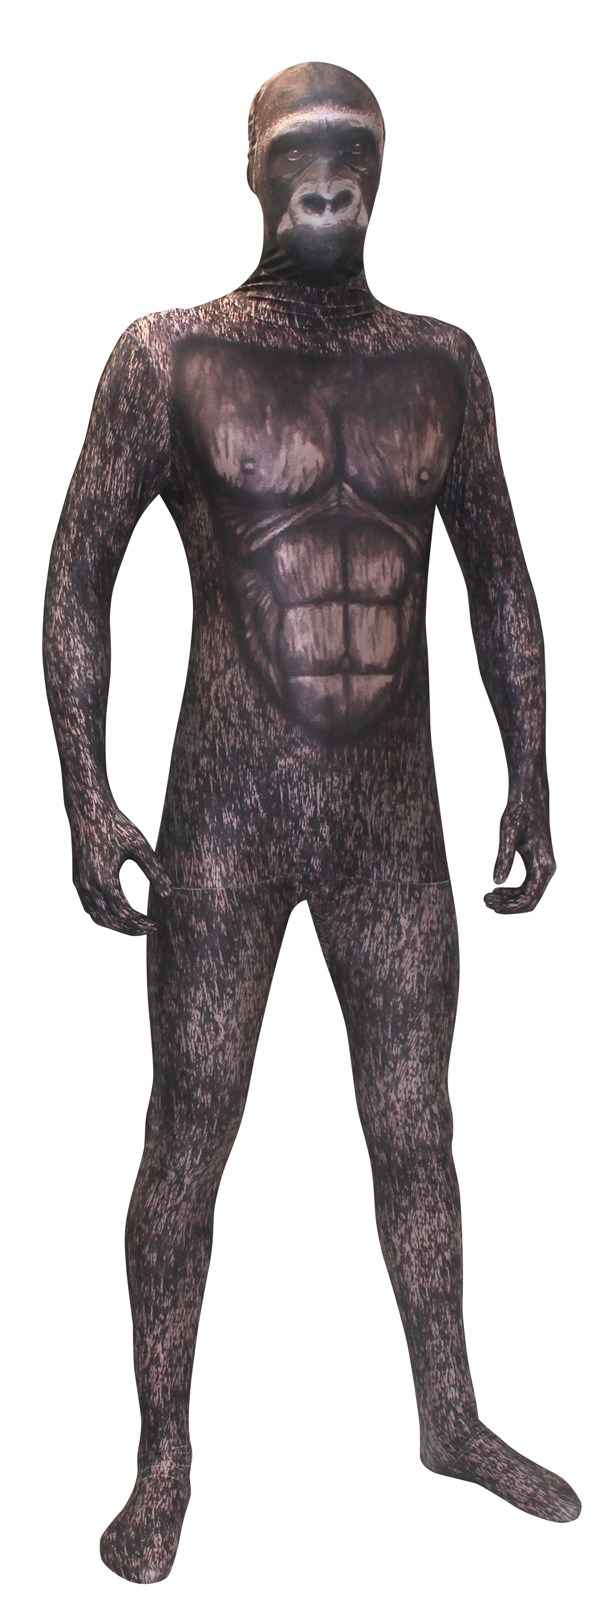 Image of Animal Planet - Silverback Gorilla Morphsuit